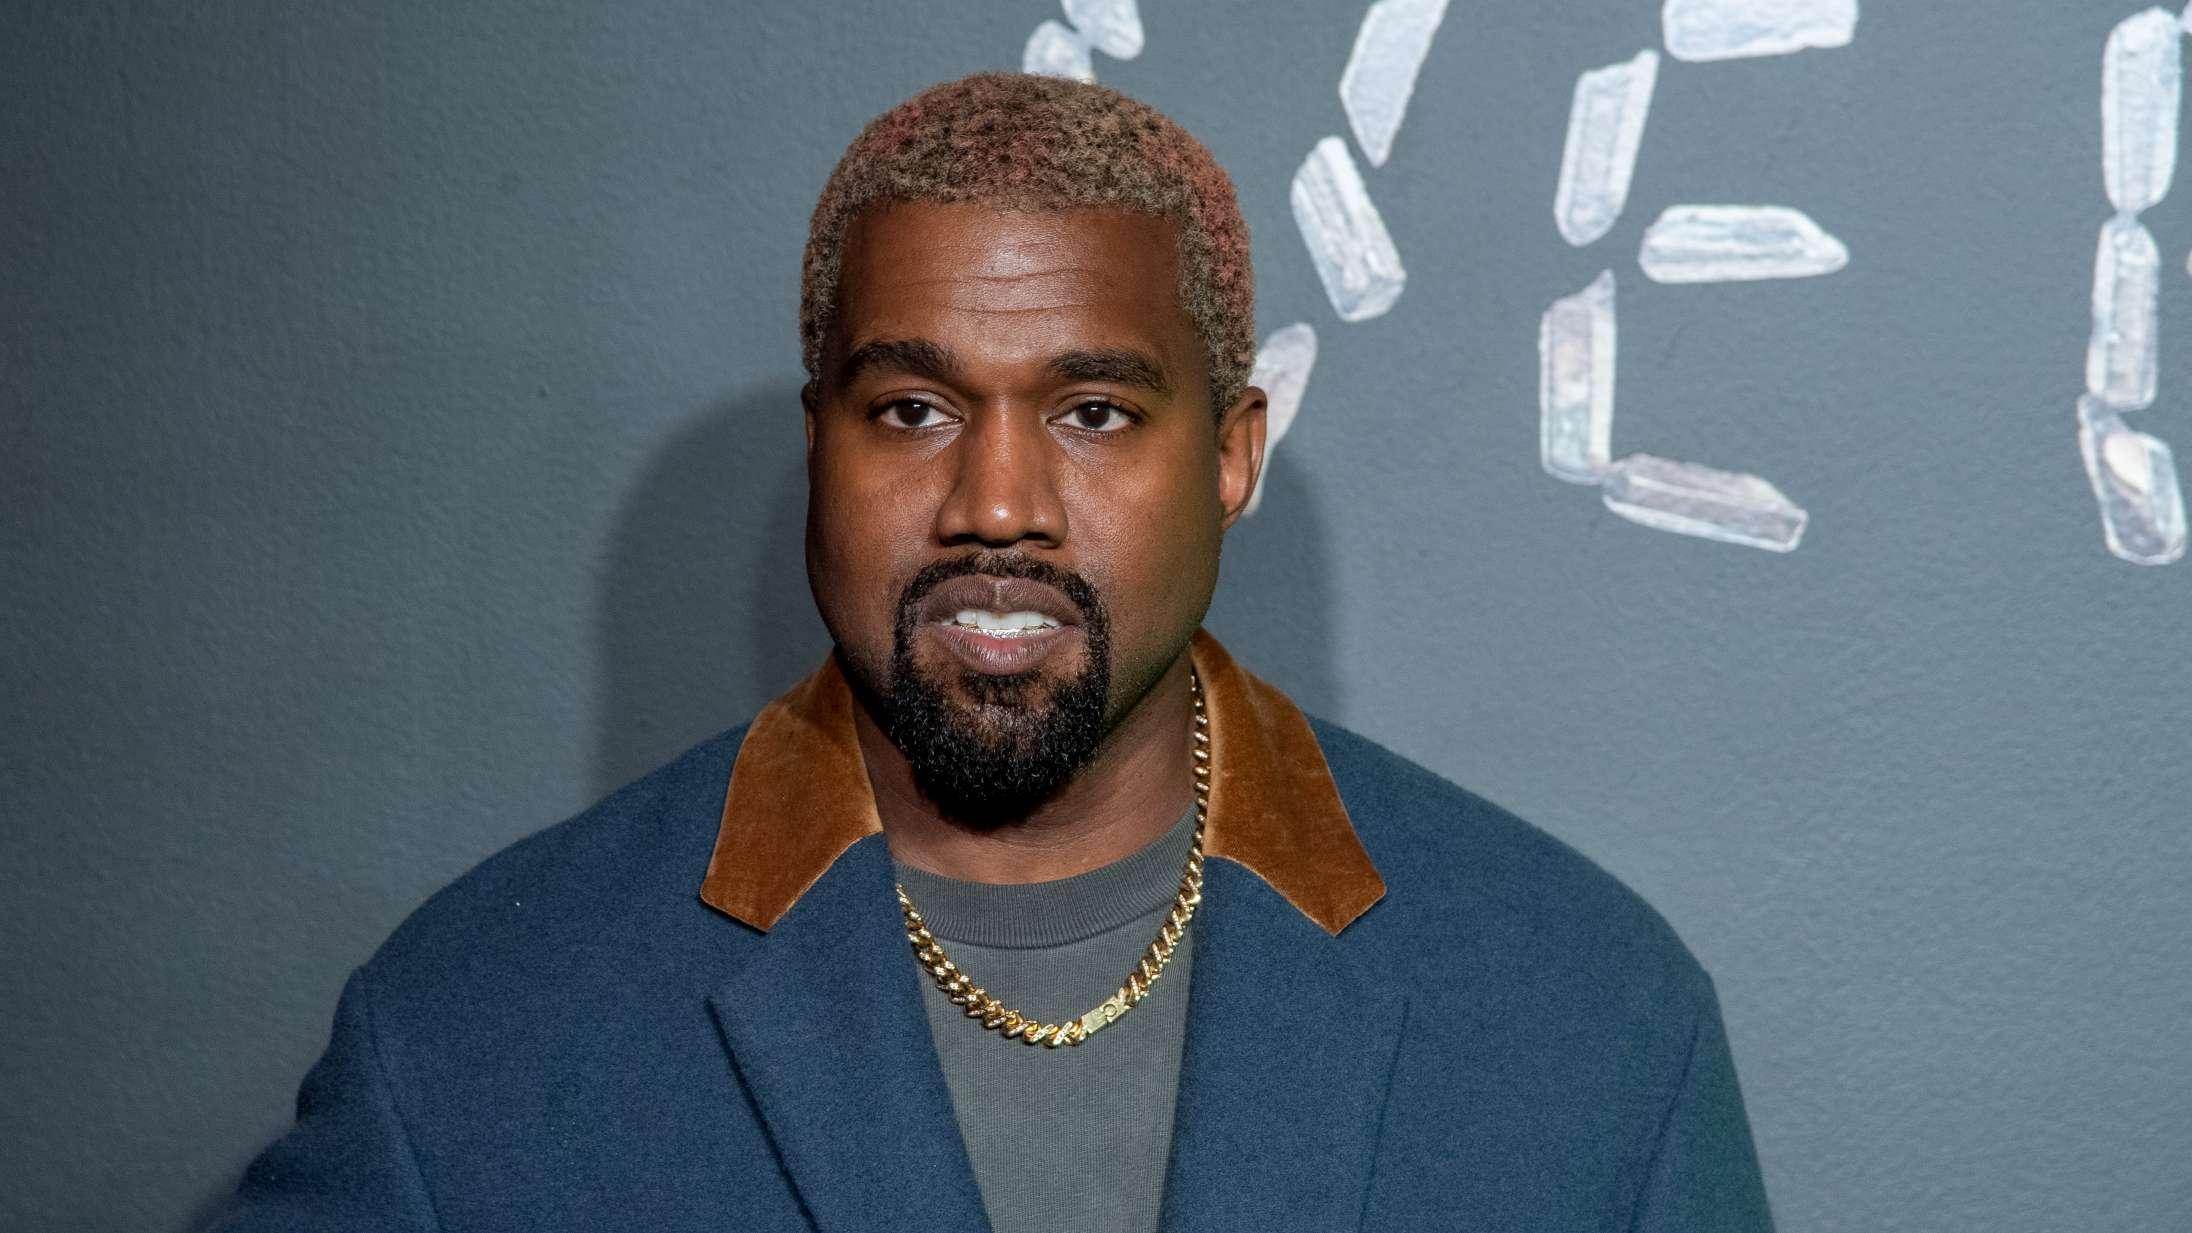 Bizart rygte går amok på TikTok: Kanye West var utro med YouTube-stjernen Jeffree Star